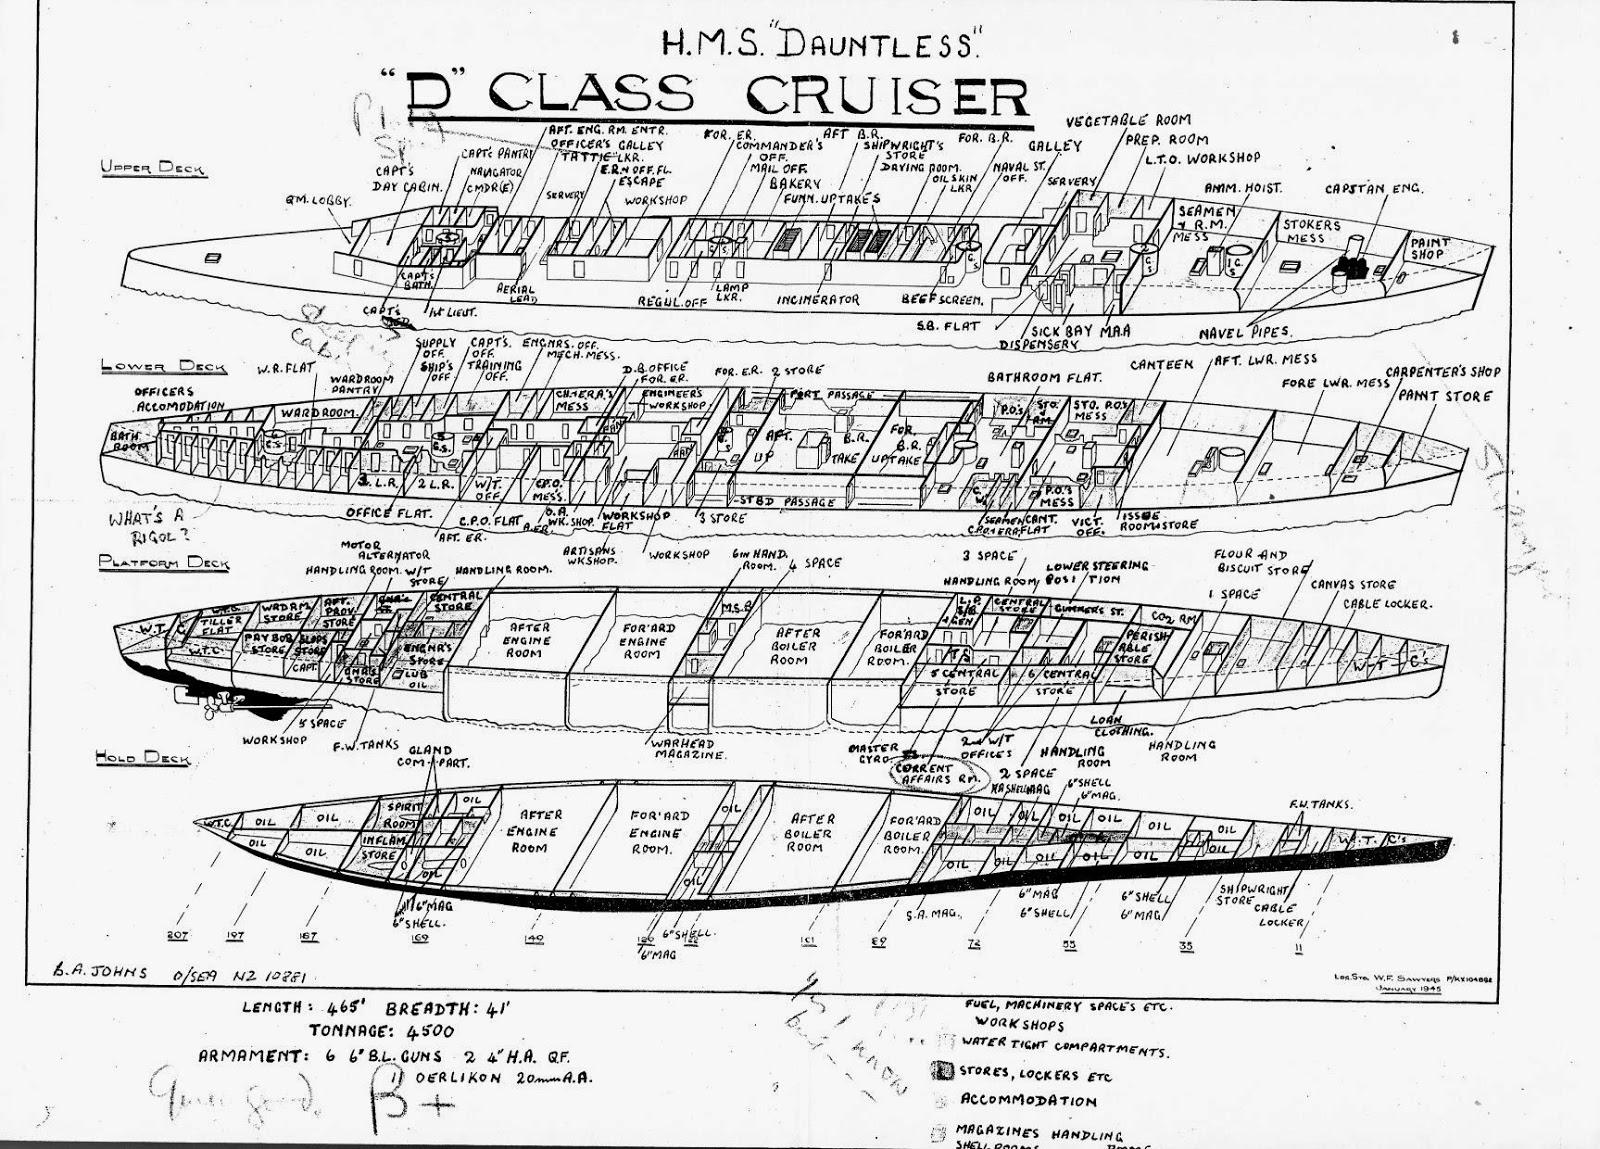 The Airfix Tribute Forum View Topic HMS DANAE